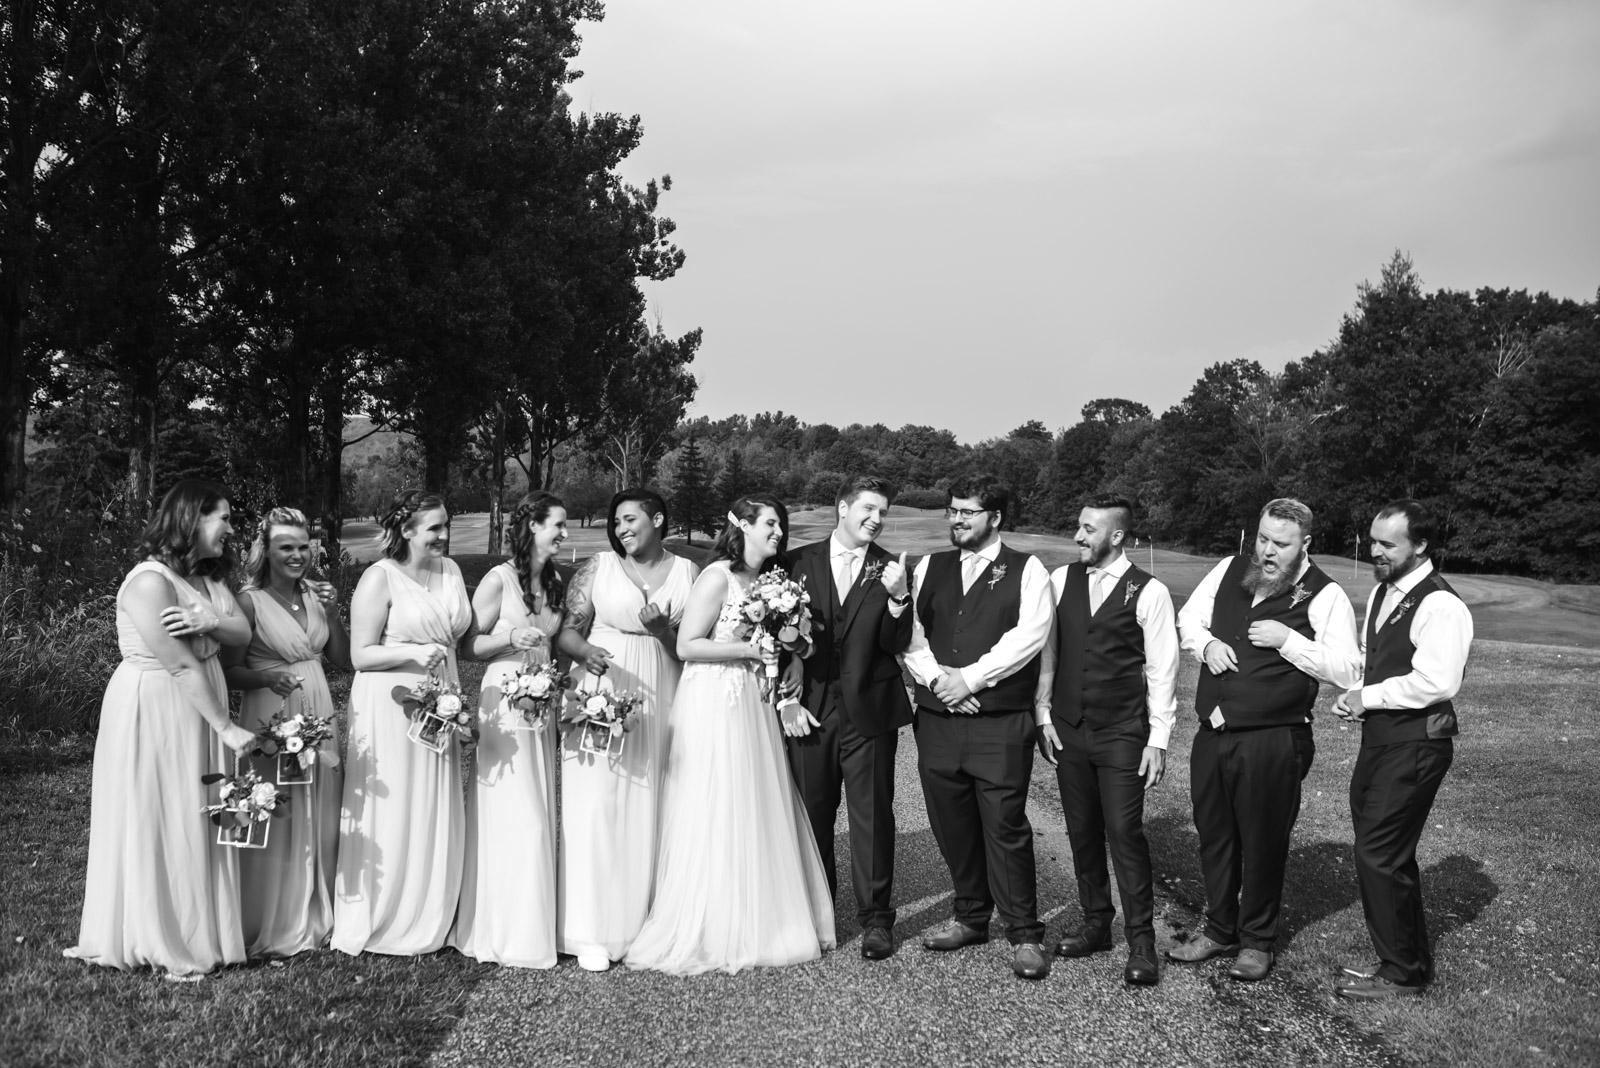 Emerson & Elicia's Golf Course Wedding Aidan & Leanne Hennebry Hamilton Wedding Videographers Photographers Niagara Hush Hush Photography & Film-41.jpg